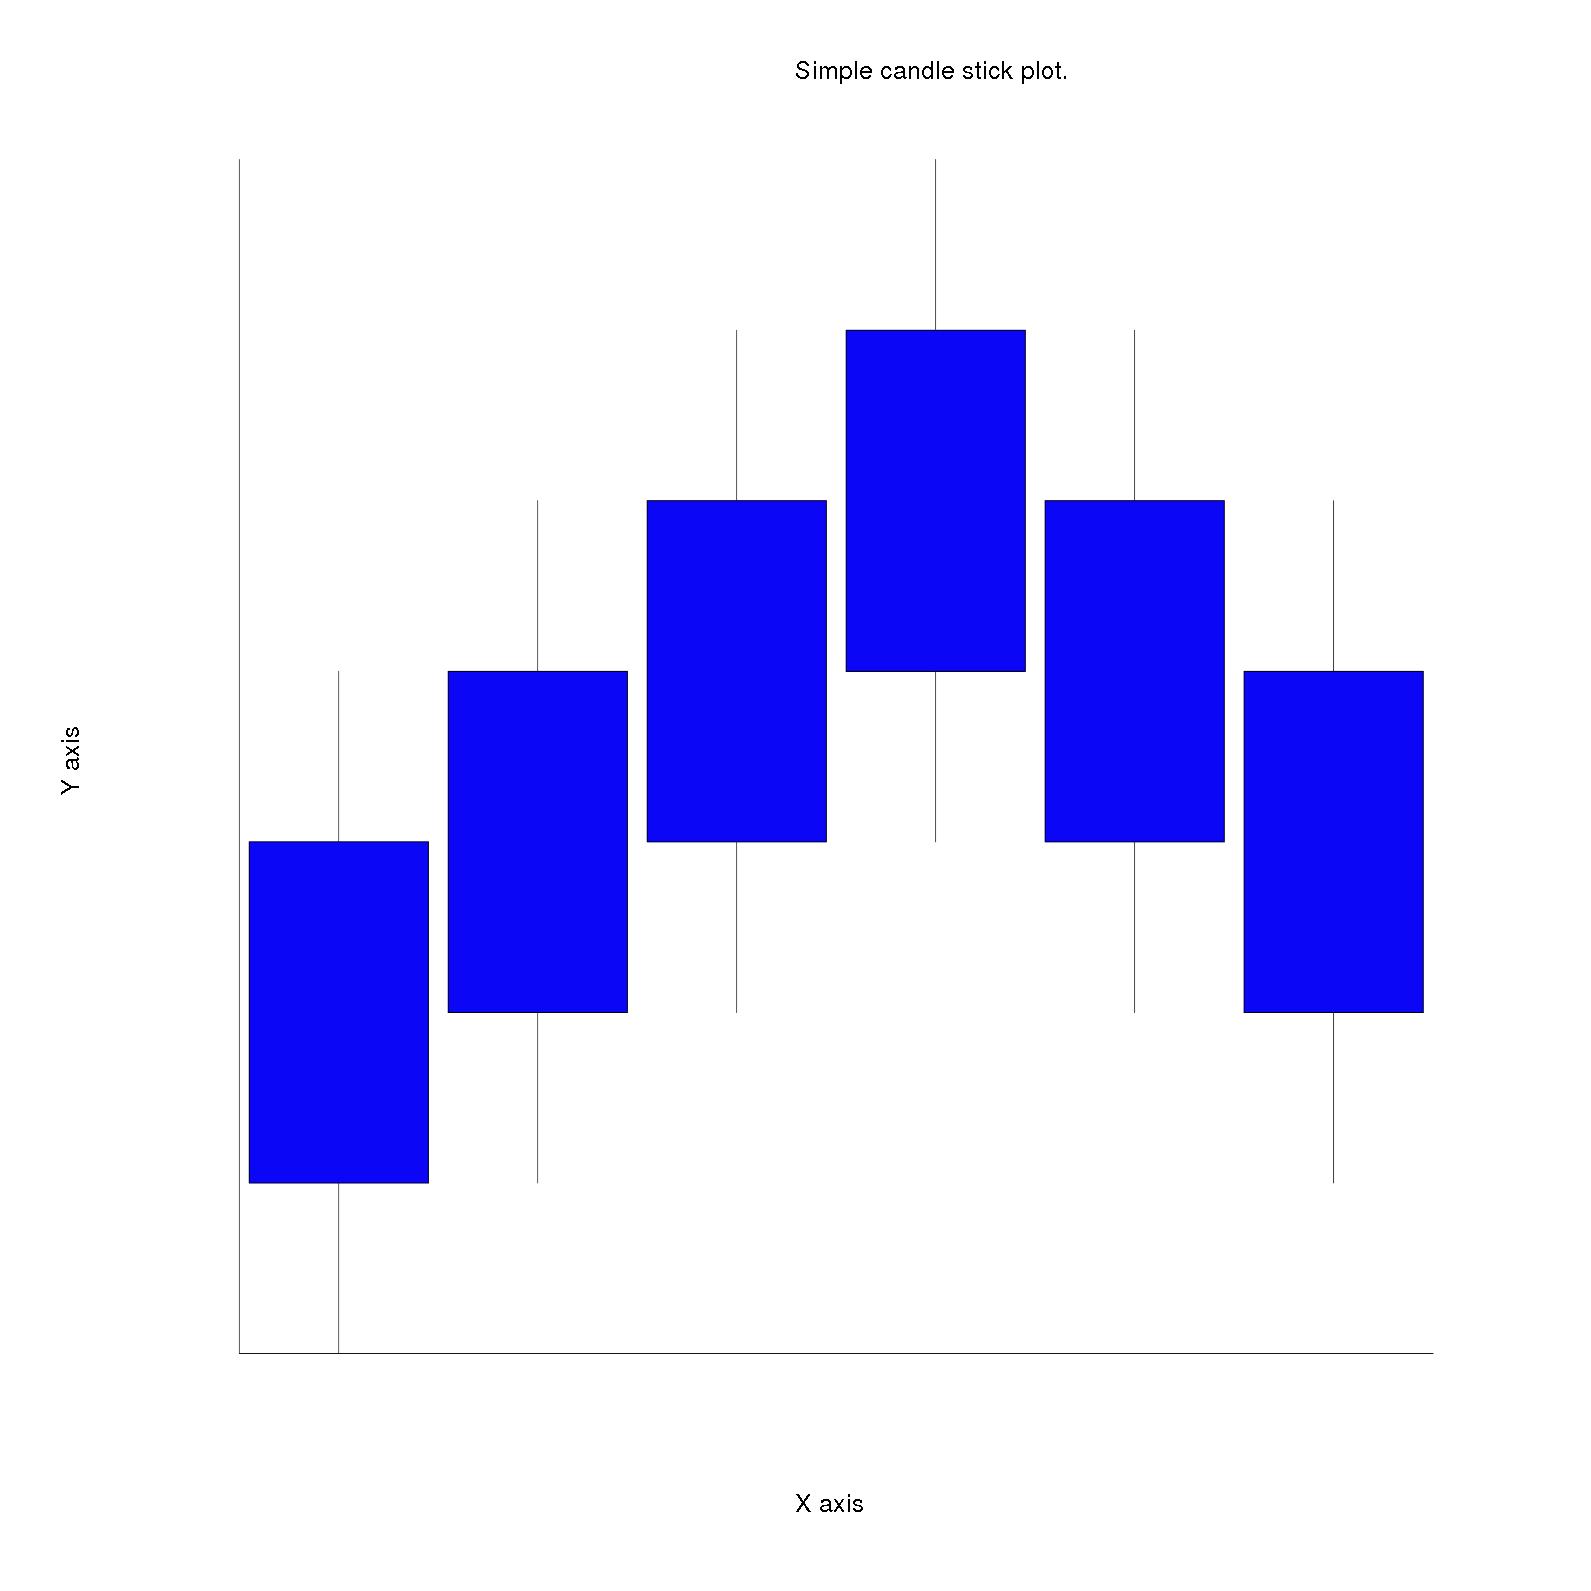 candlestick plot